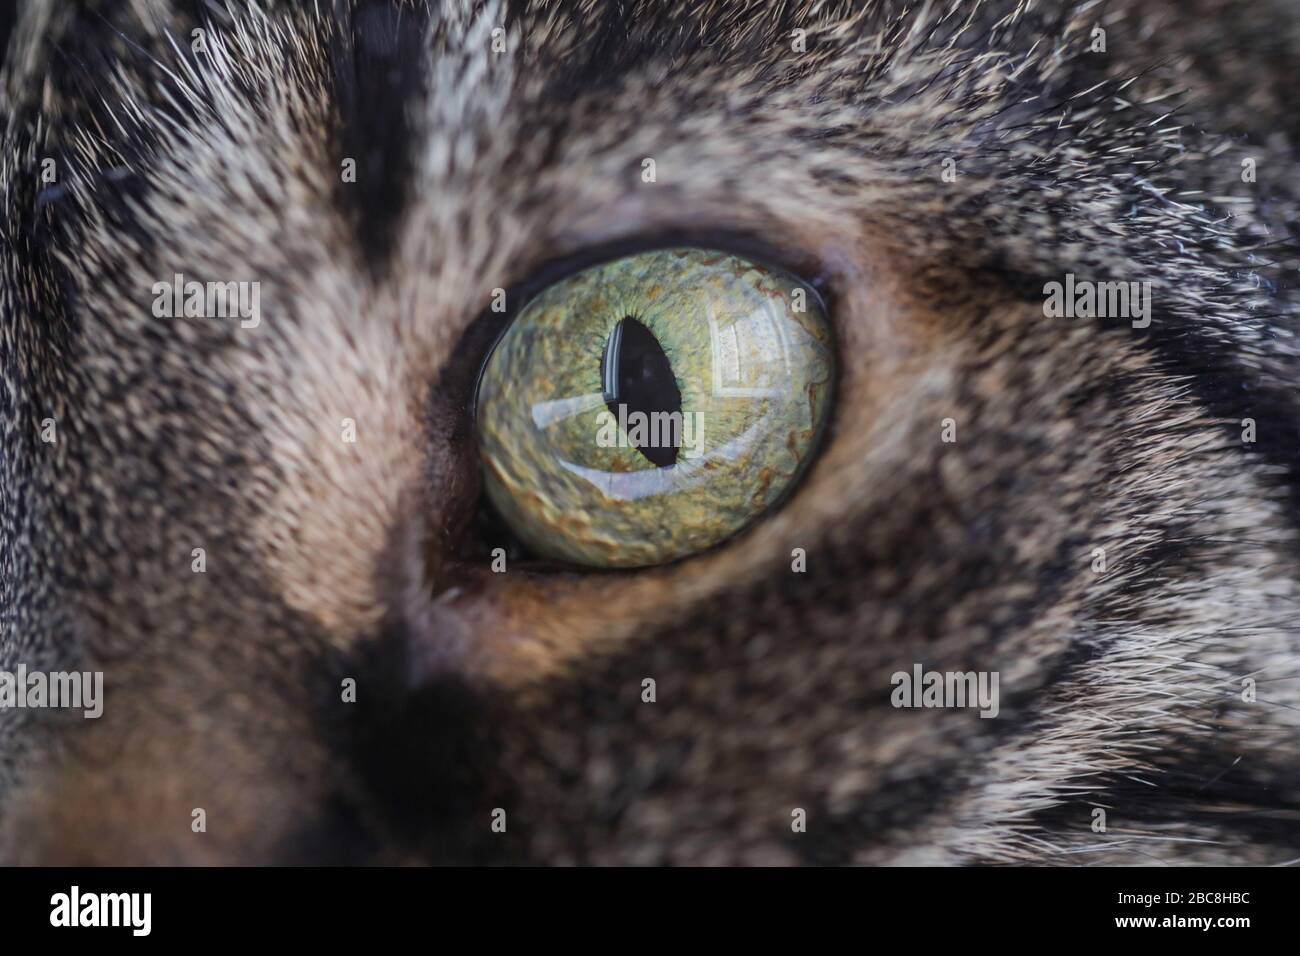 Imagen de primer plano con el ojo de un gato europeo shortair gris. Foto de stock